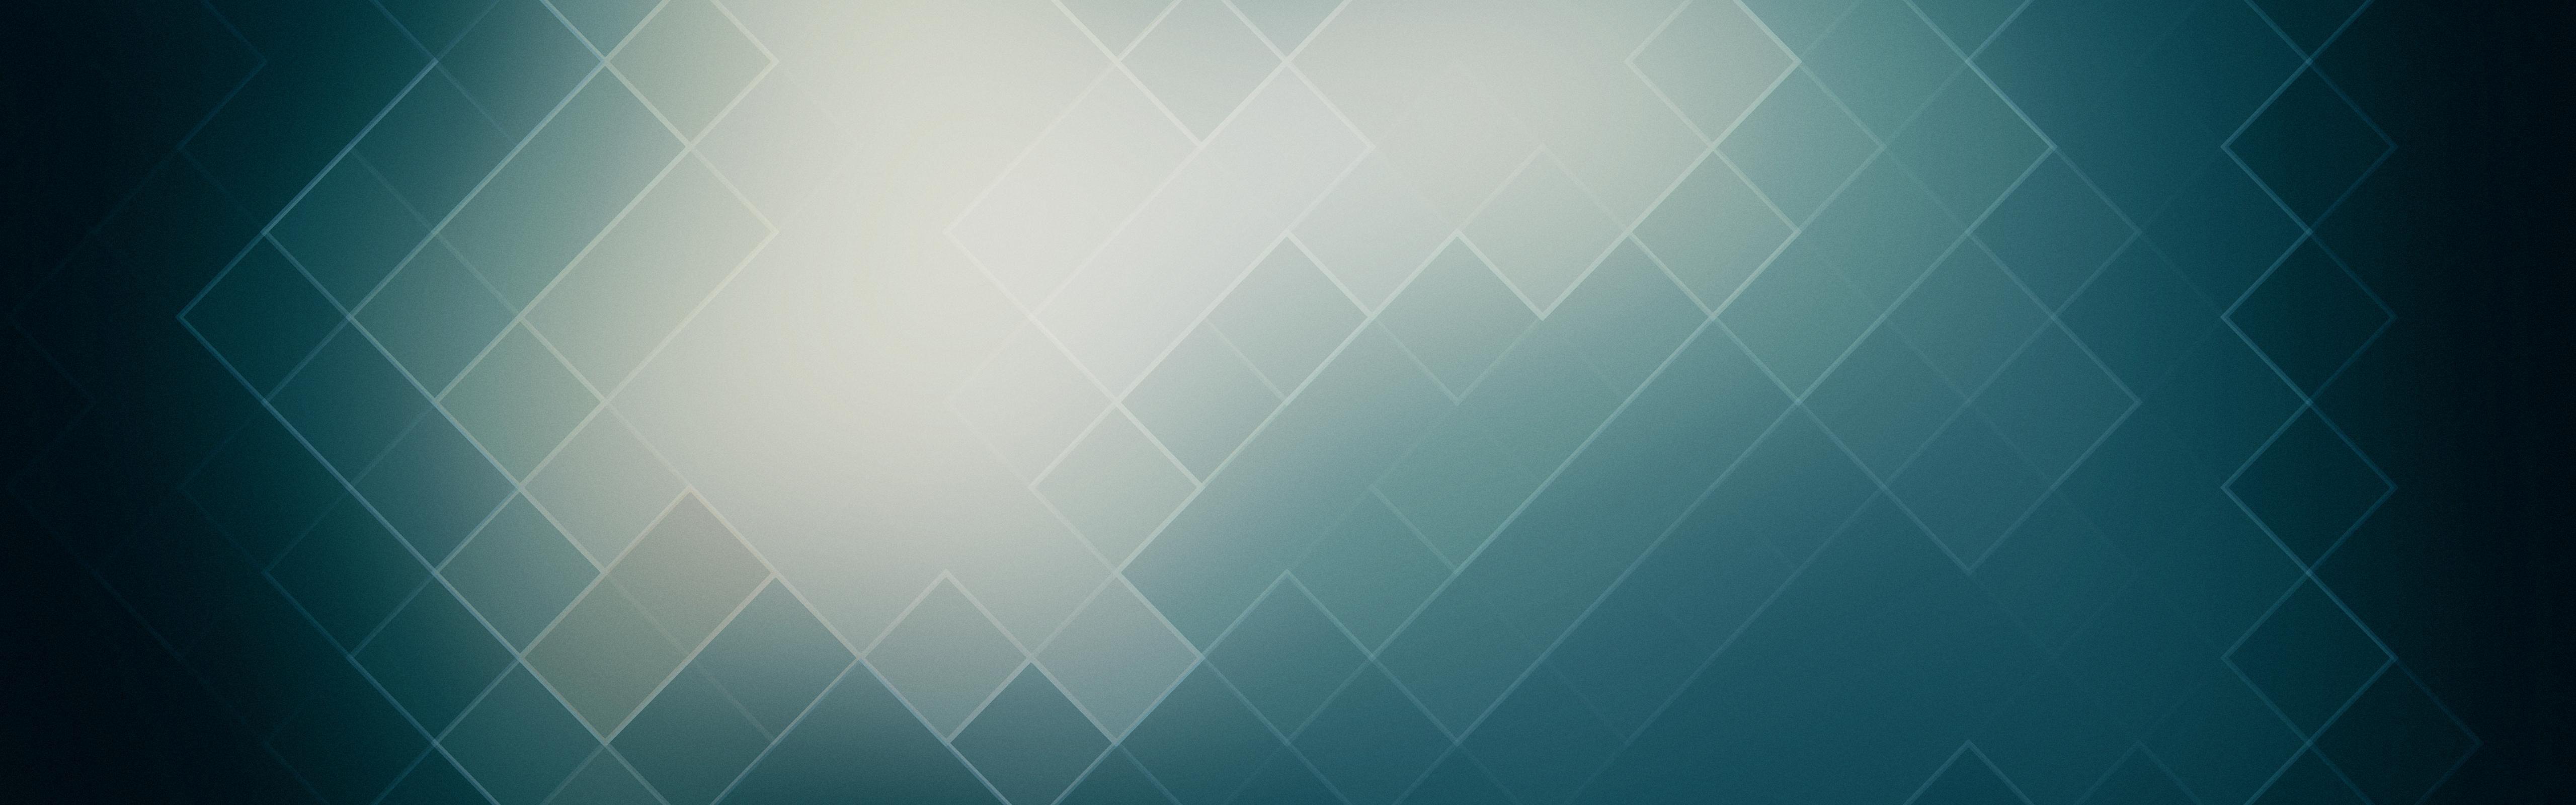 Wonderful Wallpaper Minecraft Abstract - 590a61154b7ec47f391be1baba90b330  Photograph_358537.jpg